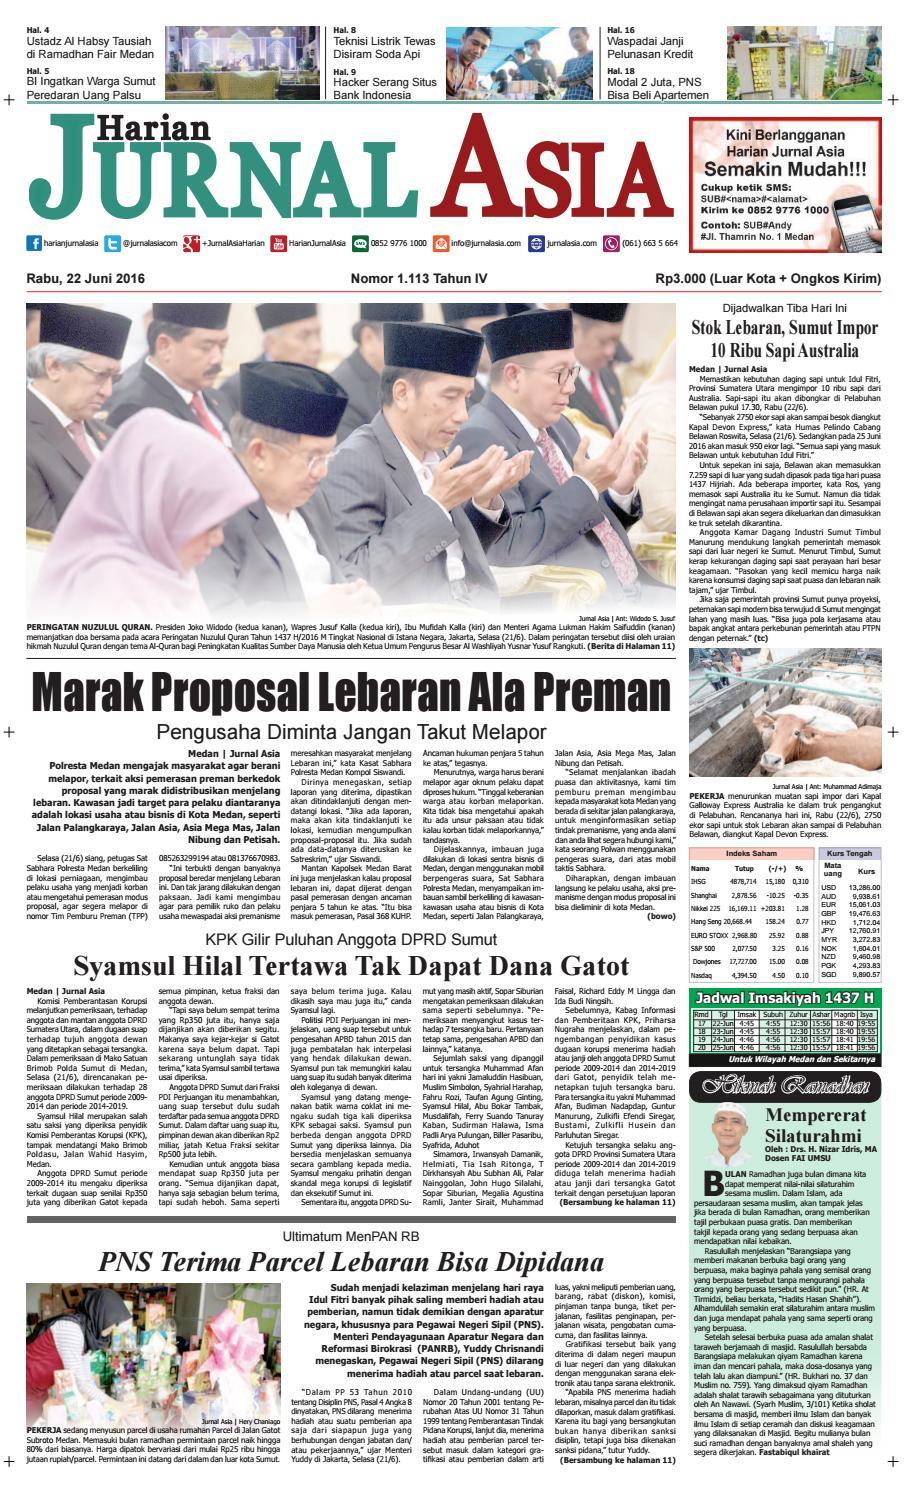 Harian Jurnal Asia Edisi Rabu 9e7c7cb595